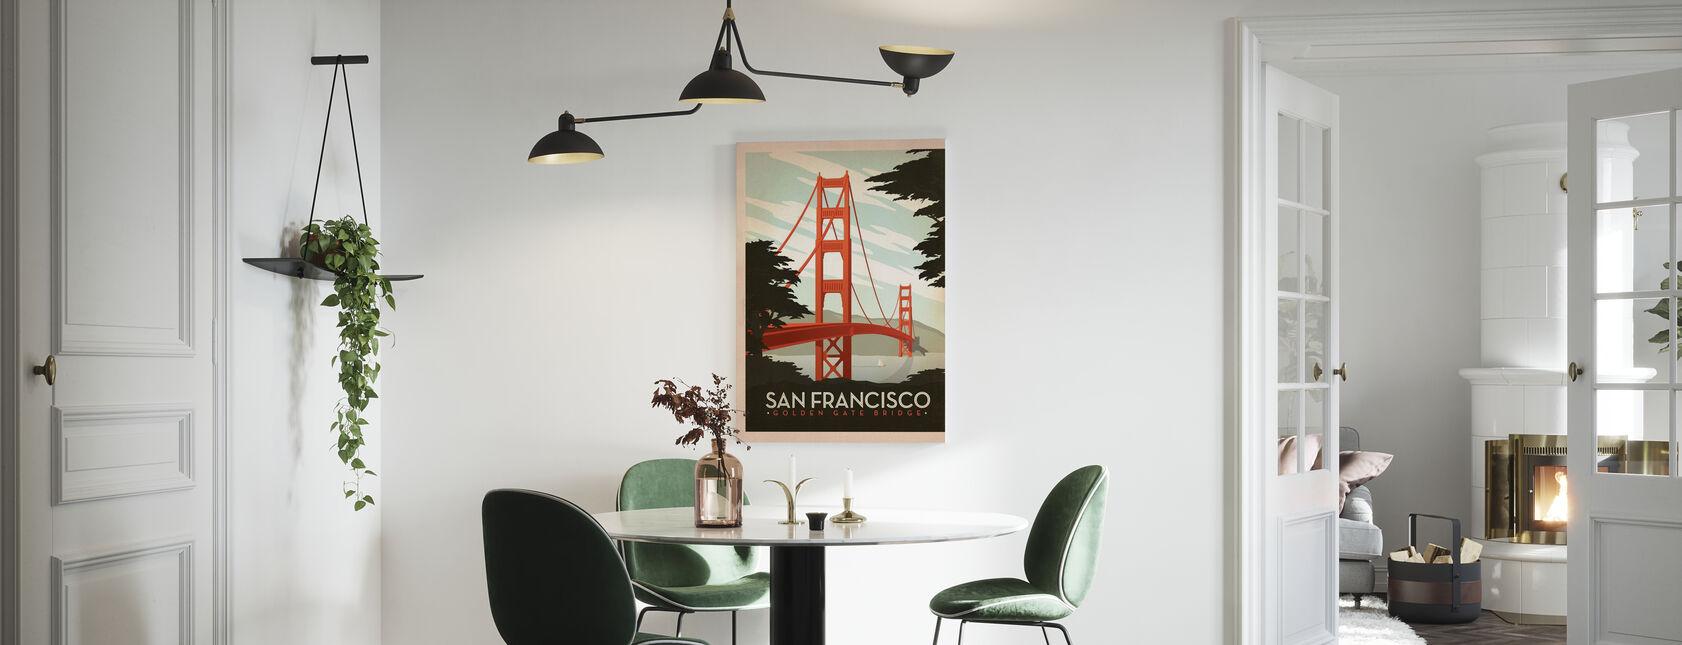 San Francisco - Canvas print - Keuken